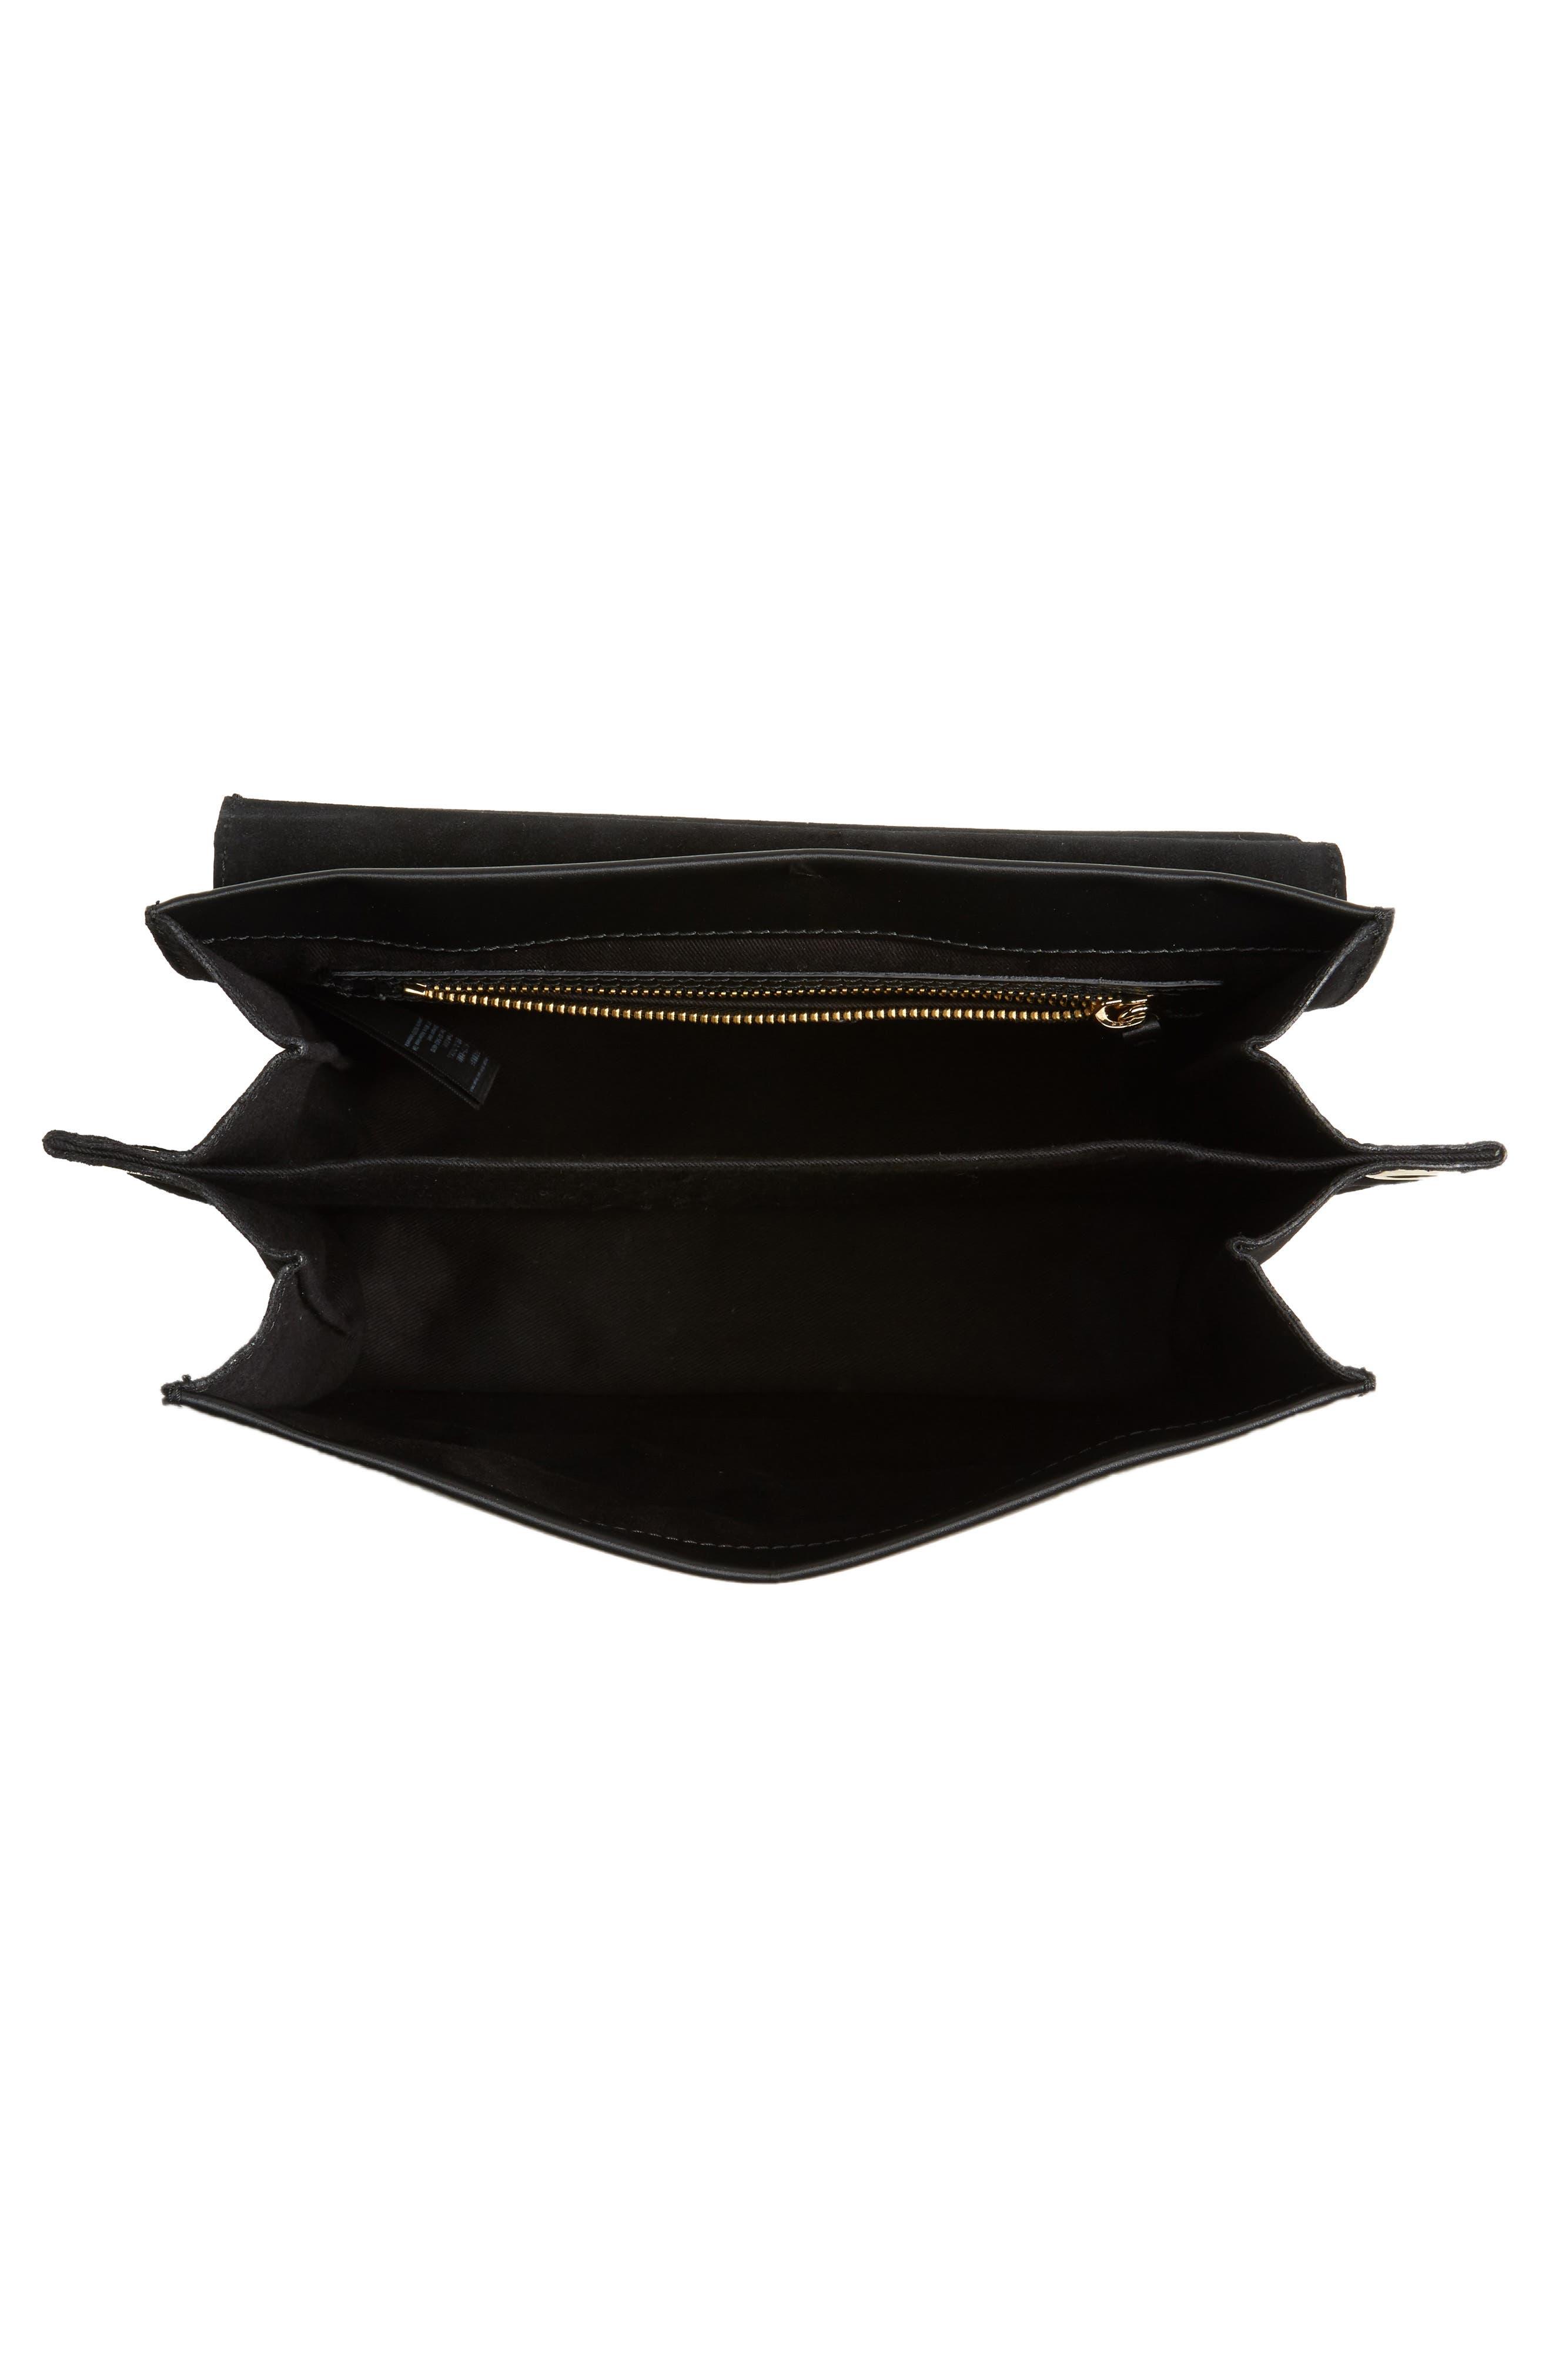 Premium Leather & Suede Soko Shoulder Bag,                             Alternate thumbnail 4, color,